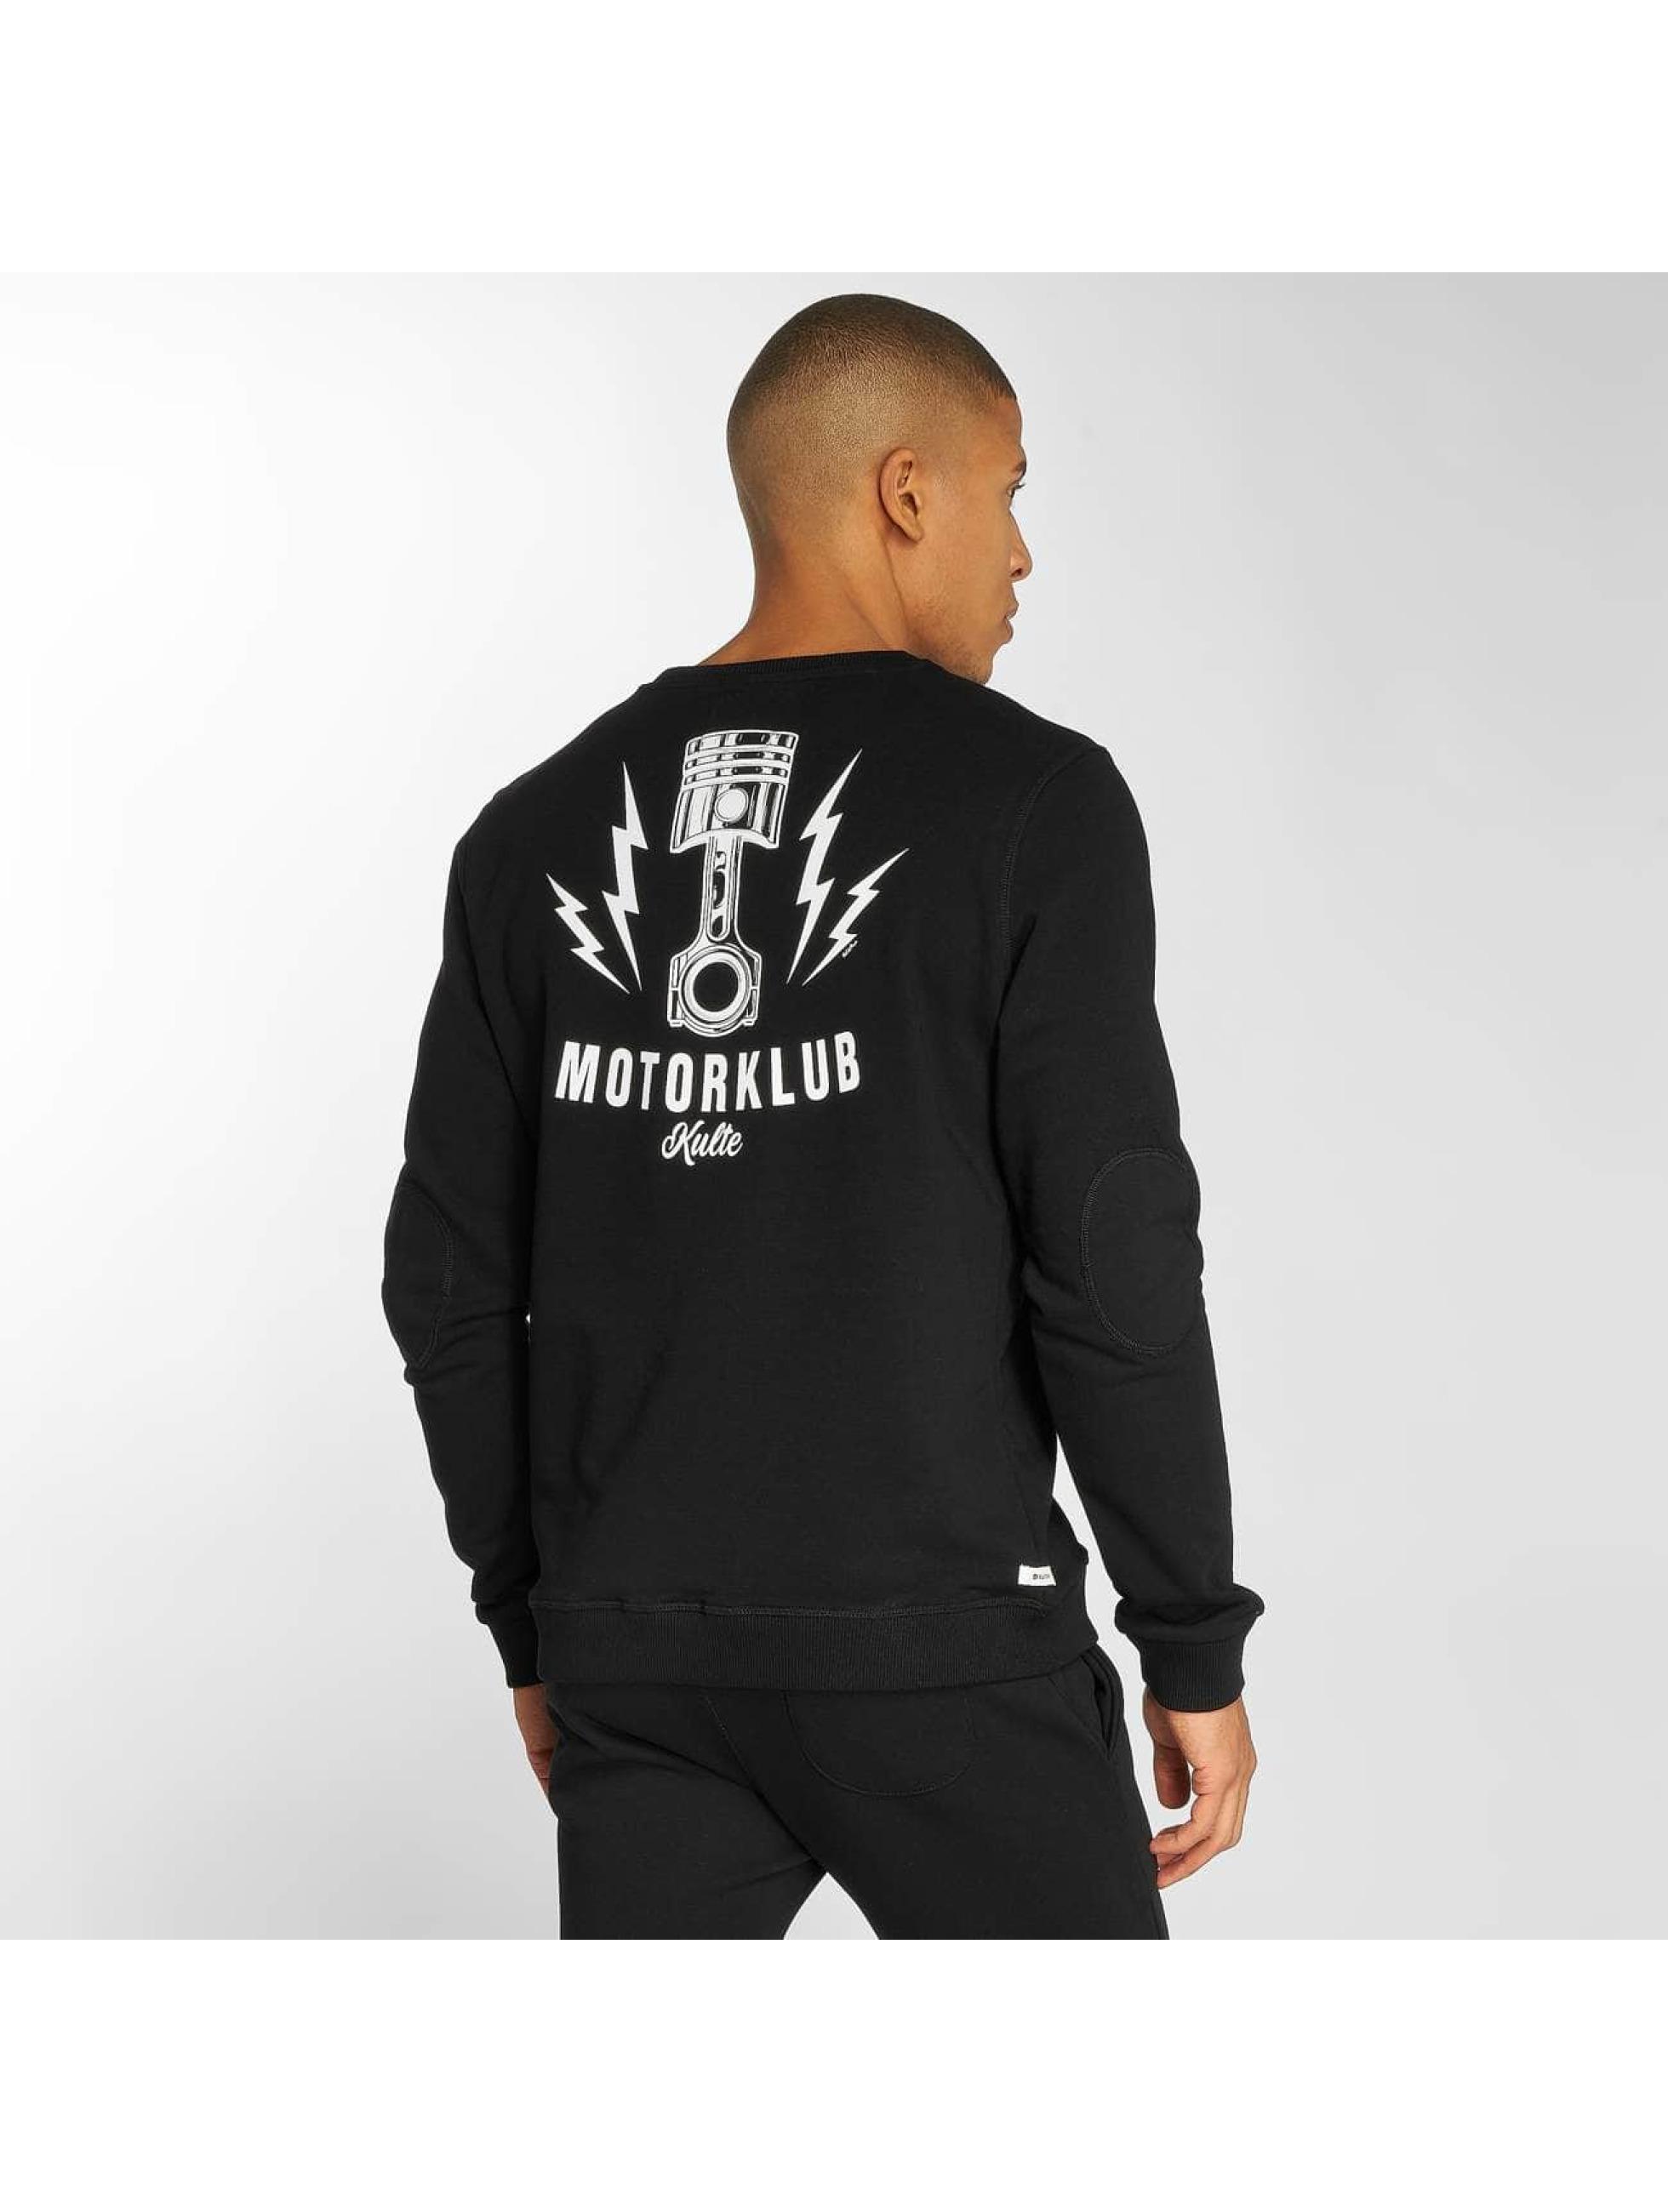 Kulte trui Motorklub zwart